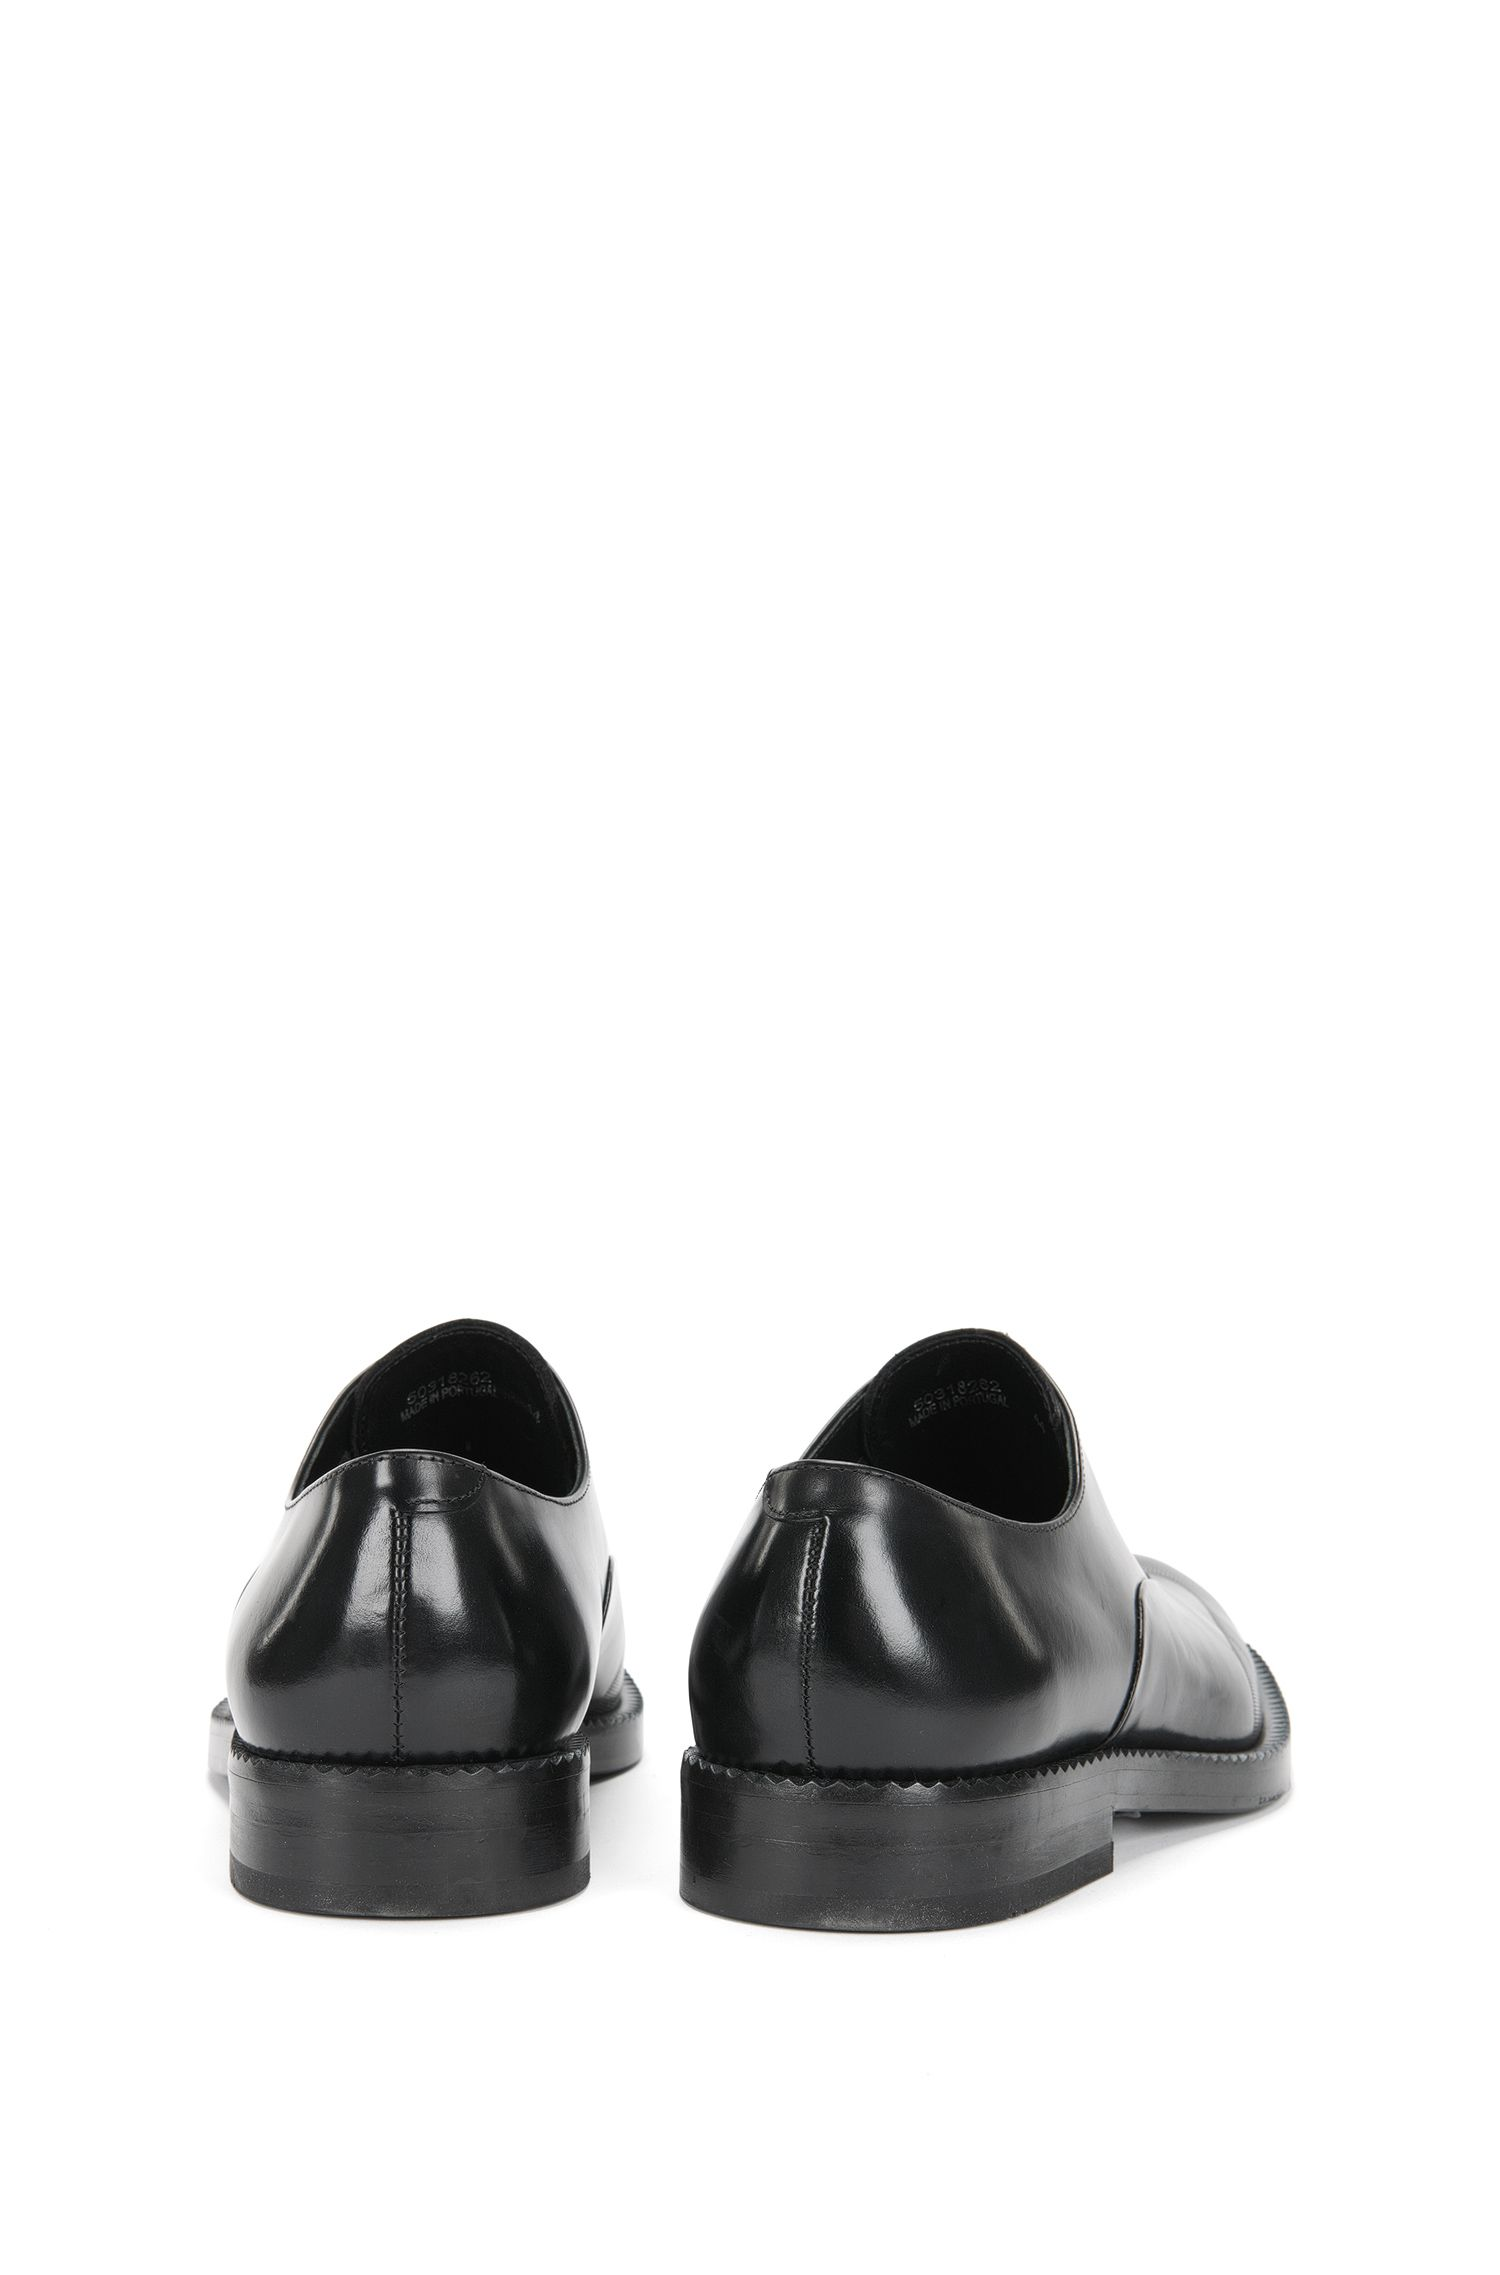 Loafer aus glattem Leder mit Reißverschluss: 'Mono-Loaf-boals'